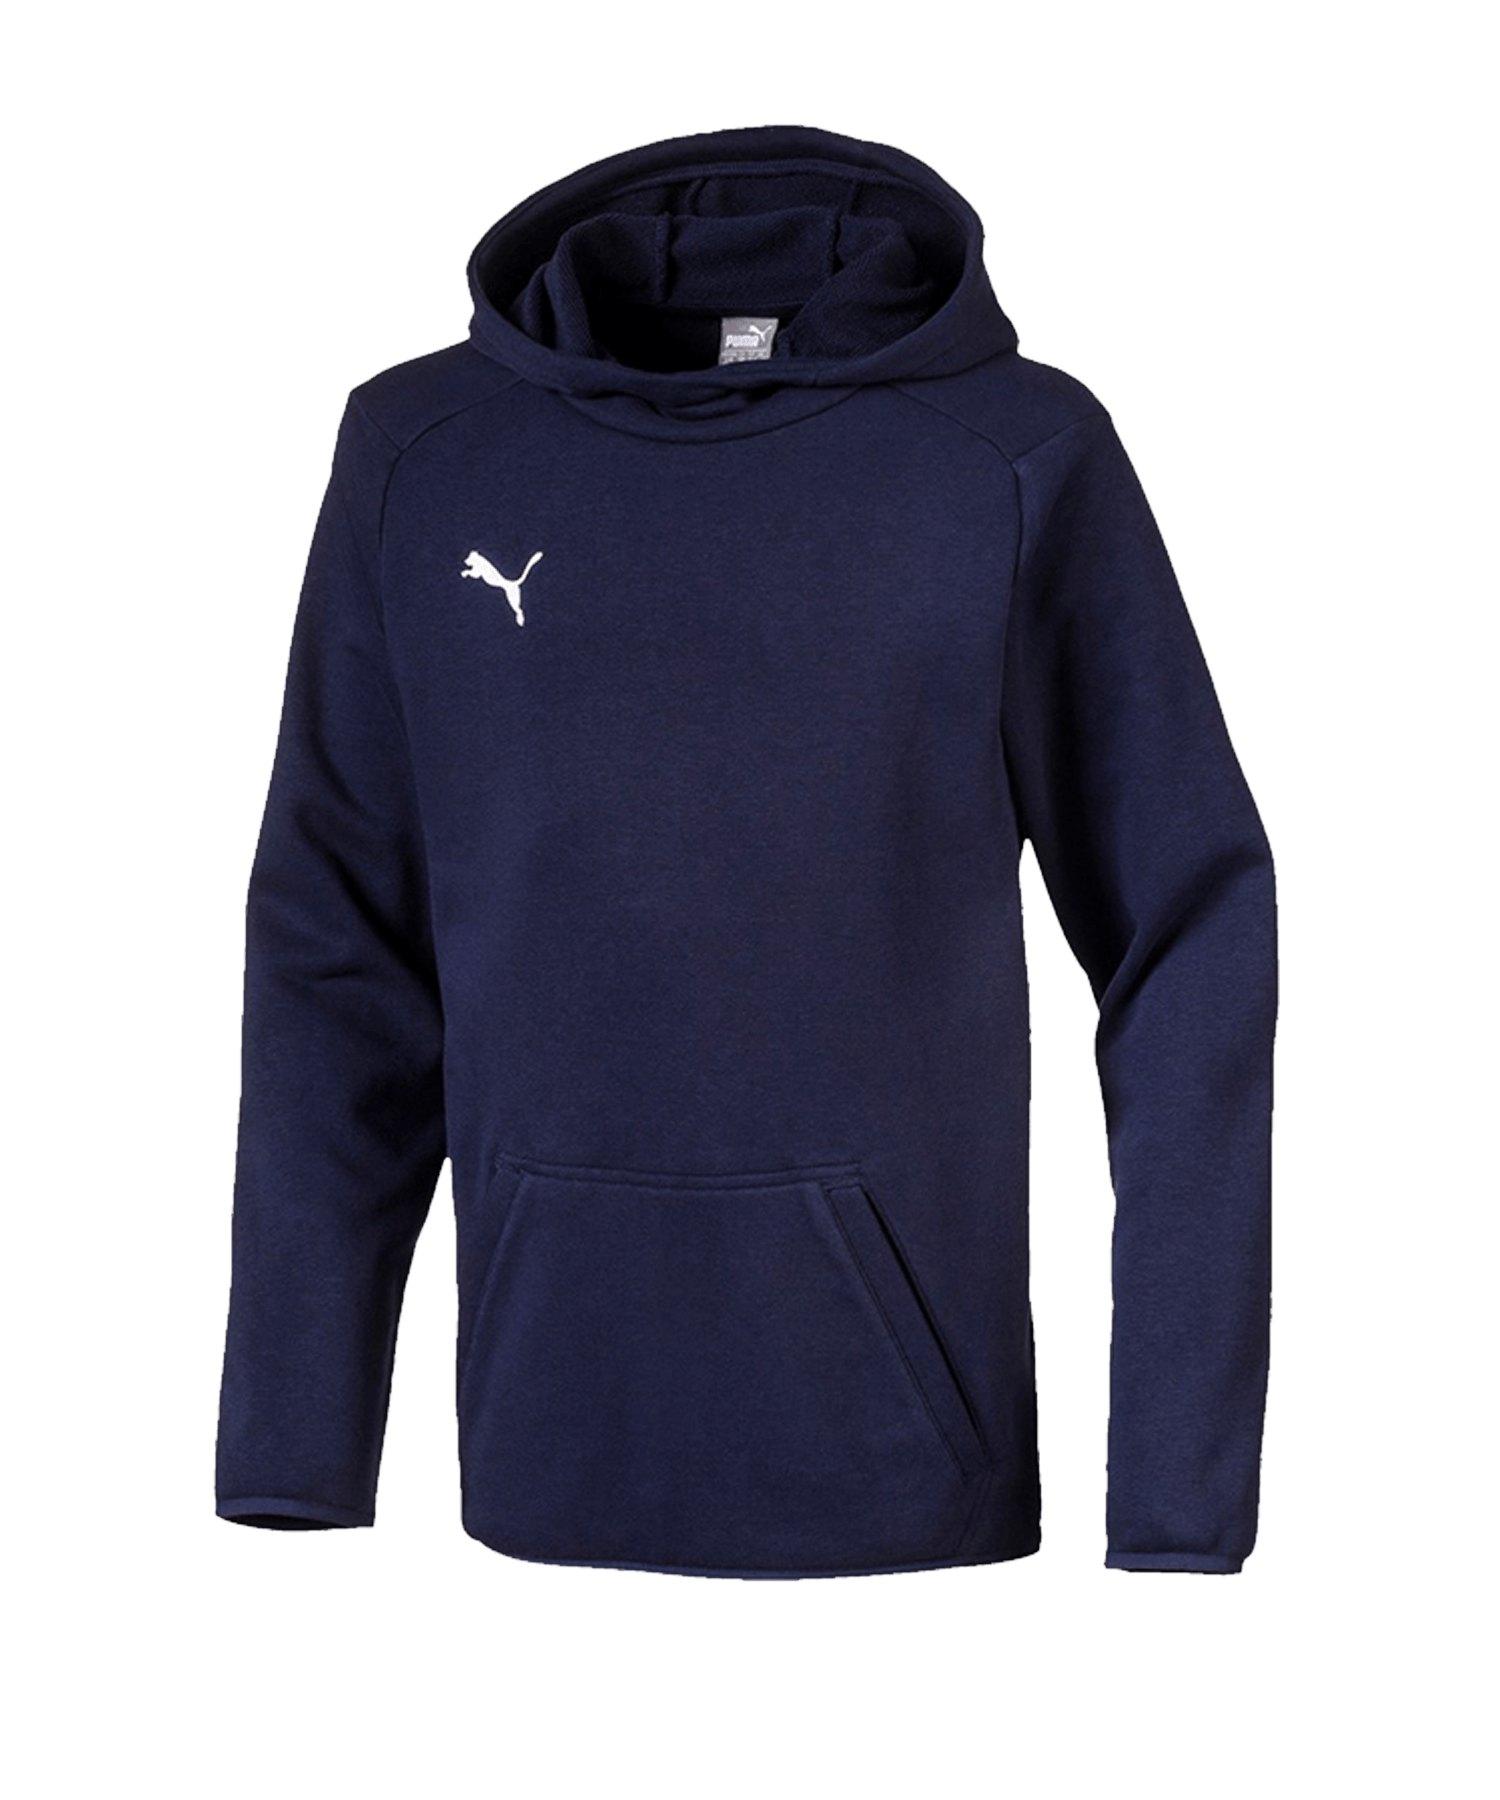 PUMA LIGA Casuals Kapuzensweatshirt Kids F06 - blau